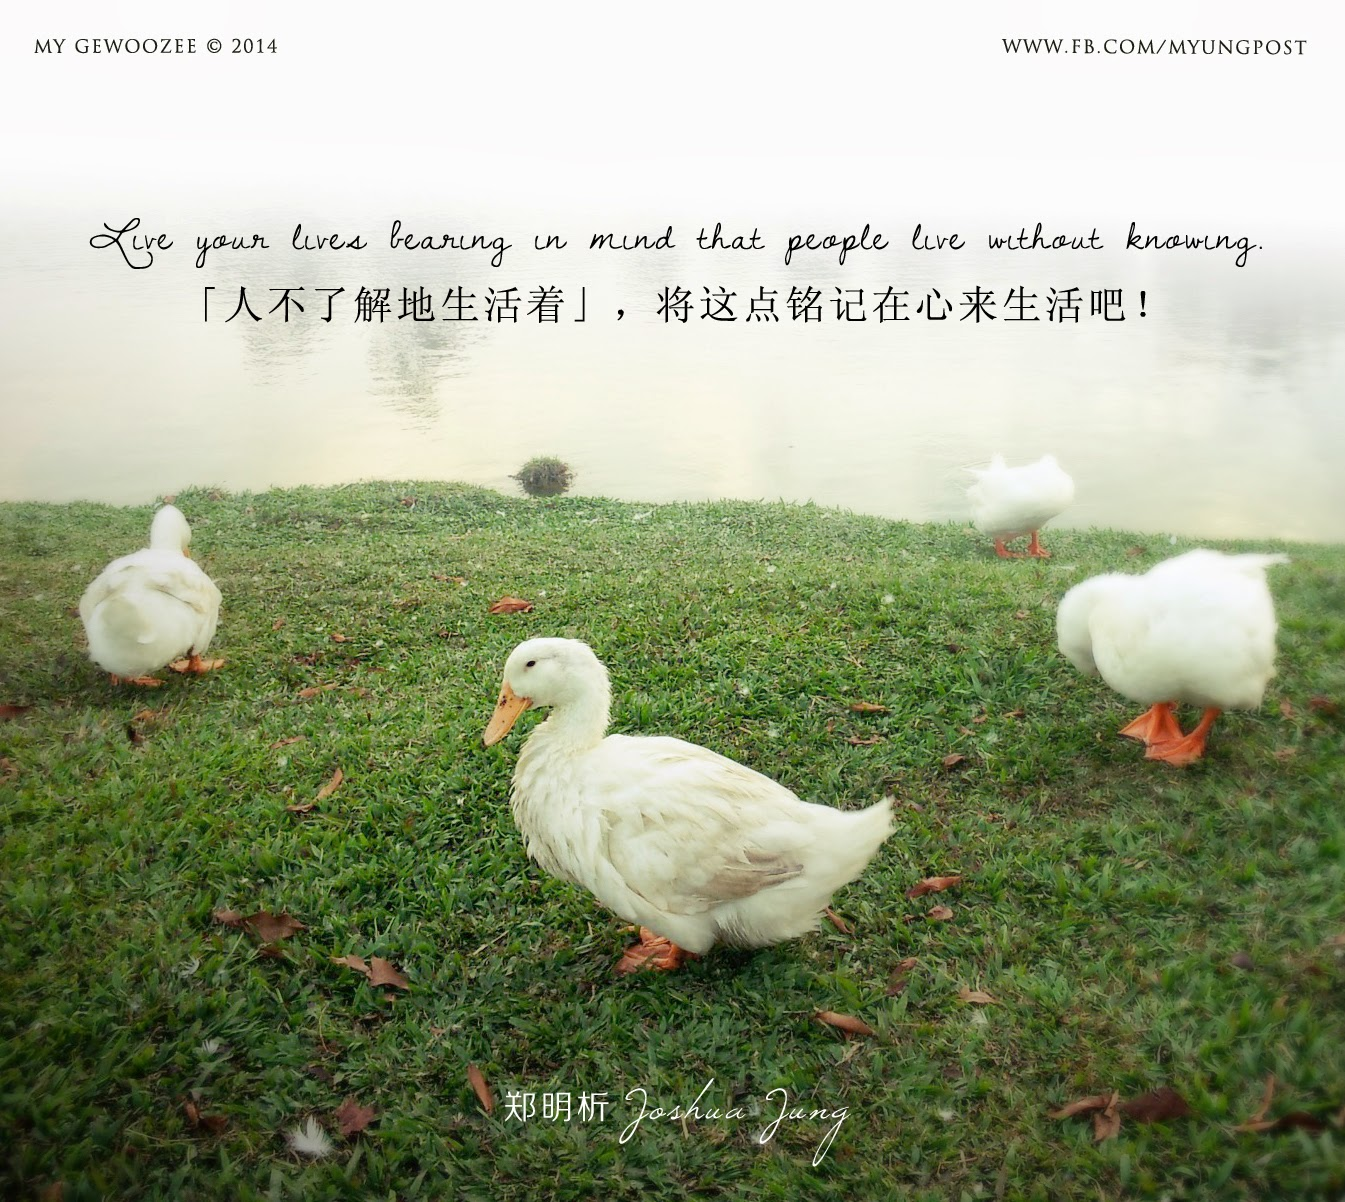 郑明析,摄理,月明洞,生活,不了解,Joshua Jung, Providence, WMD, Live, without knowing